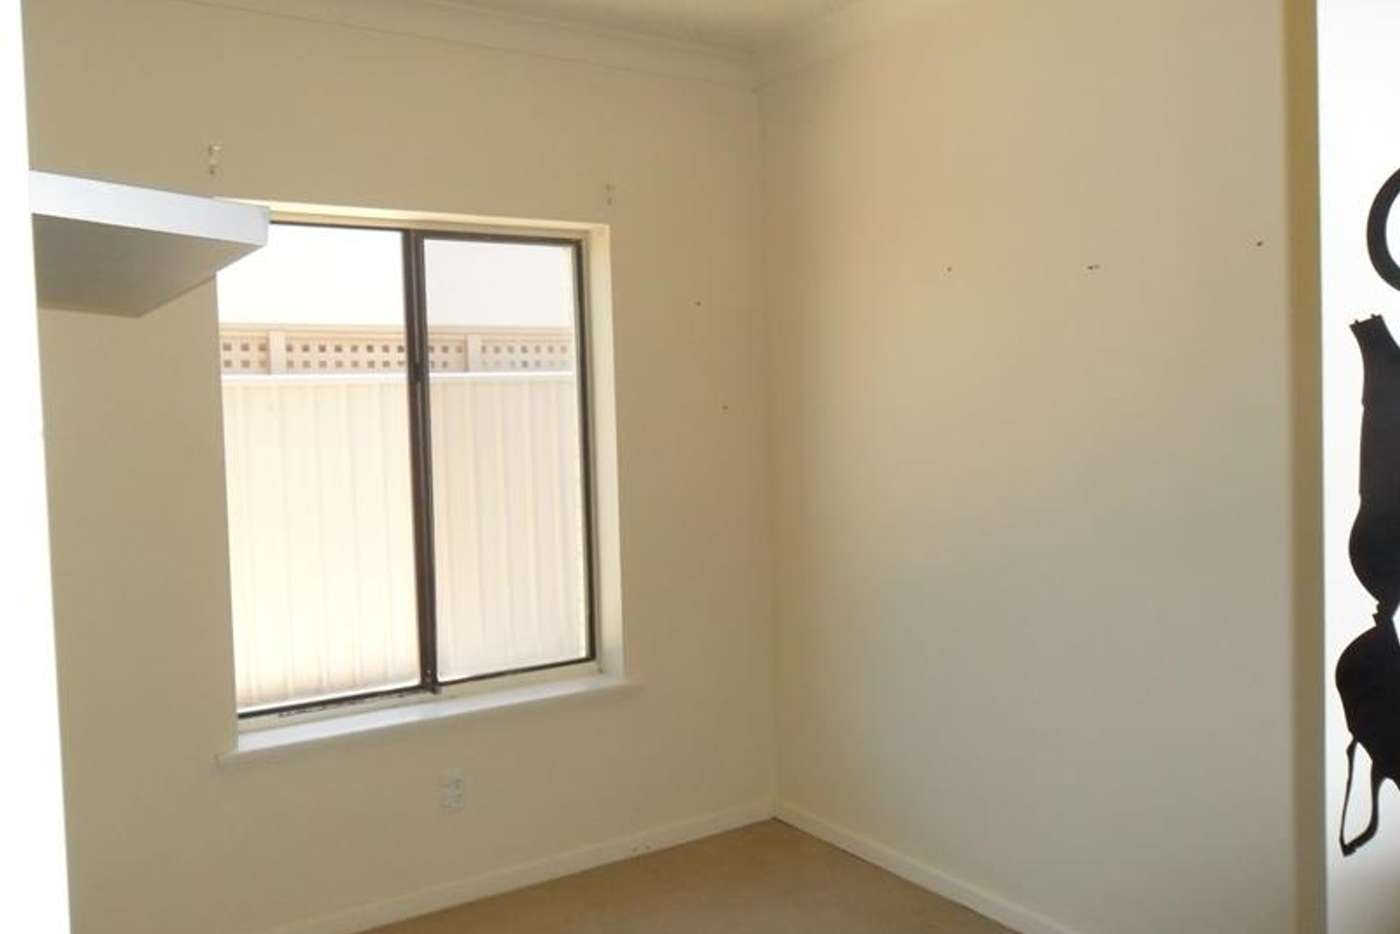 Sixth view of Homely unit listing, 14/7-9 L'Estrange Street, Glenside SA 5065